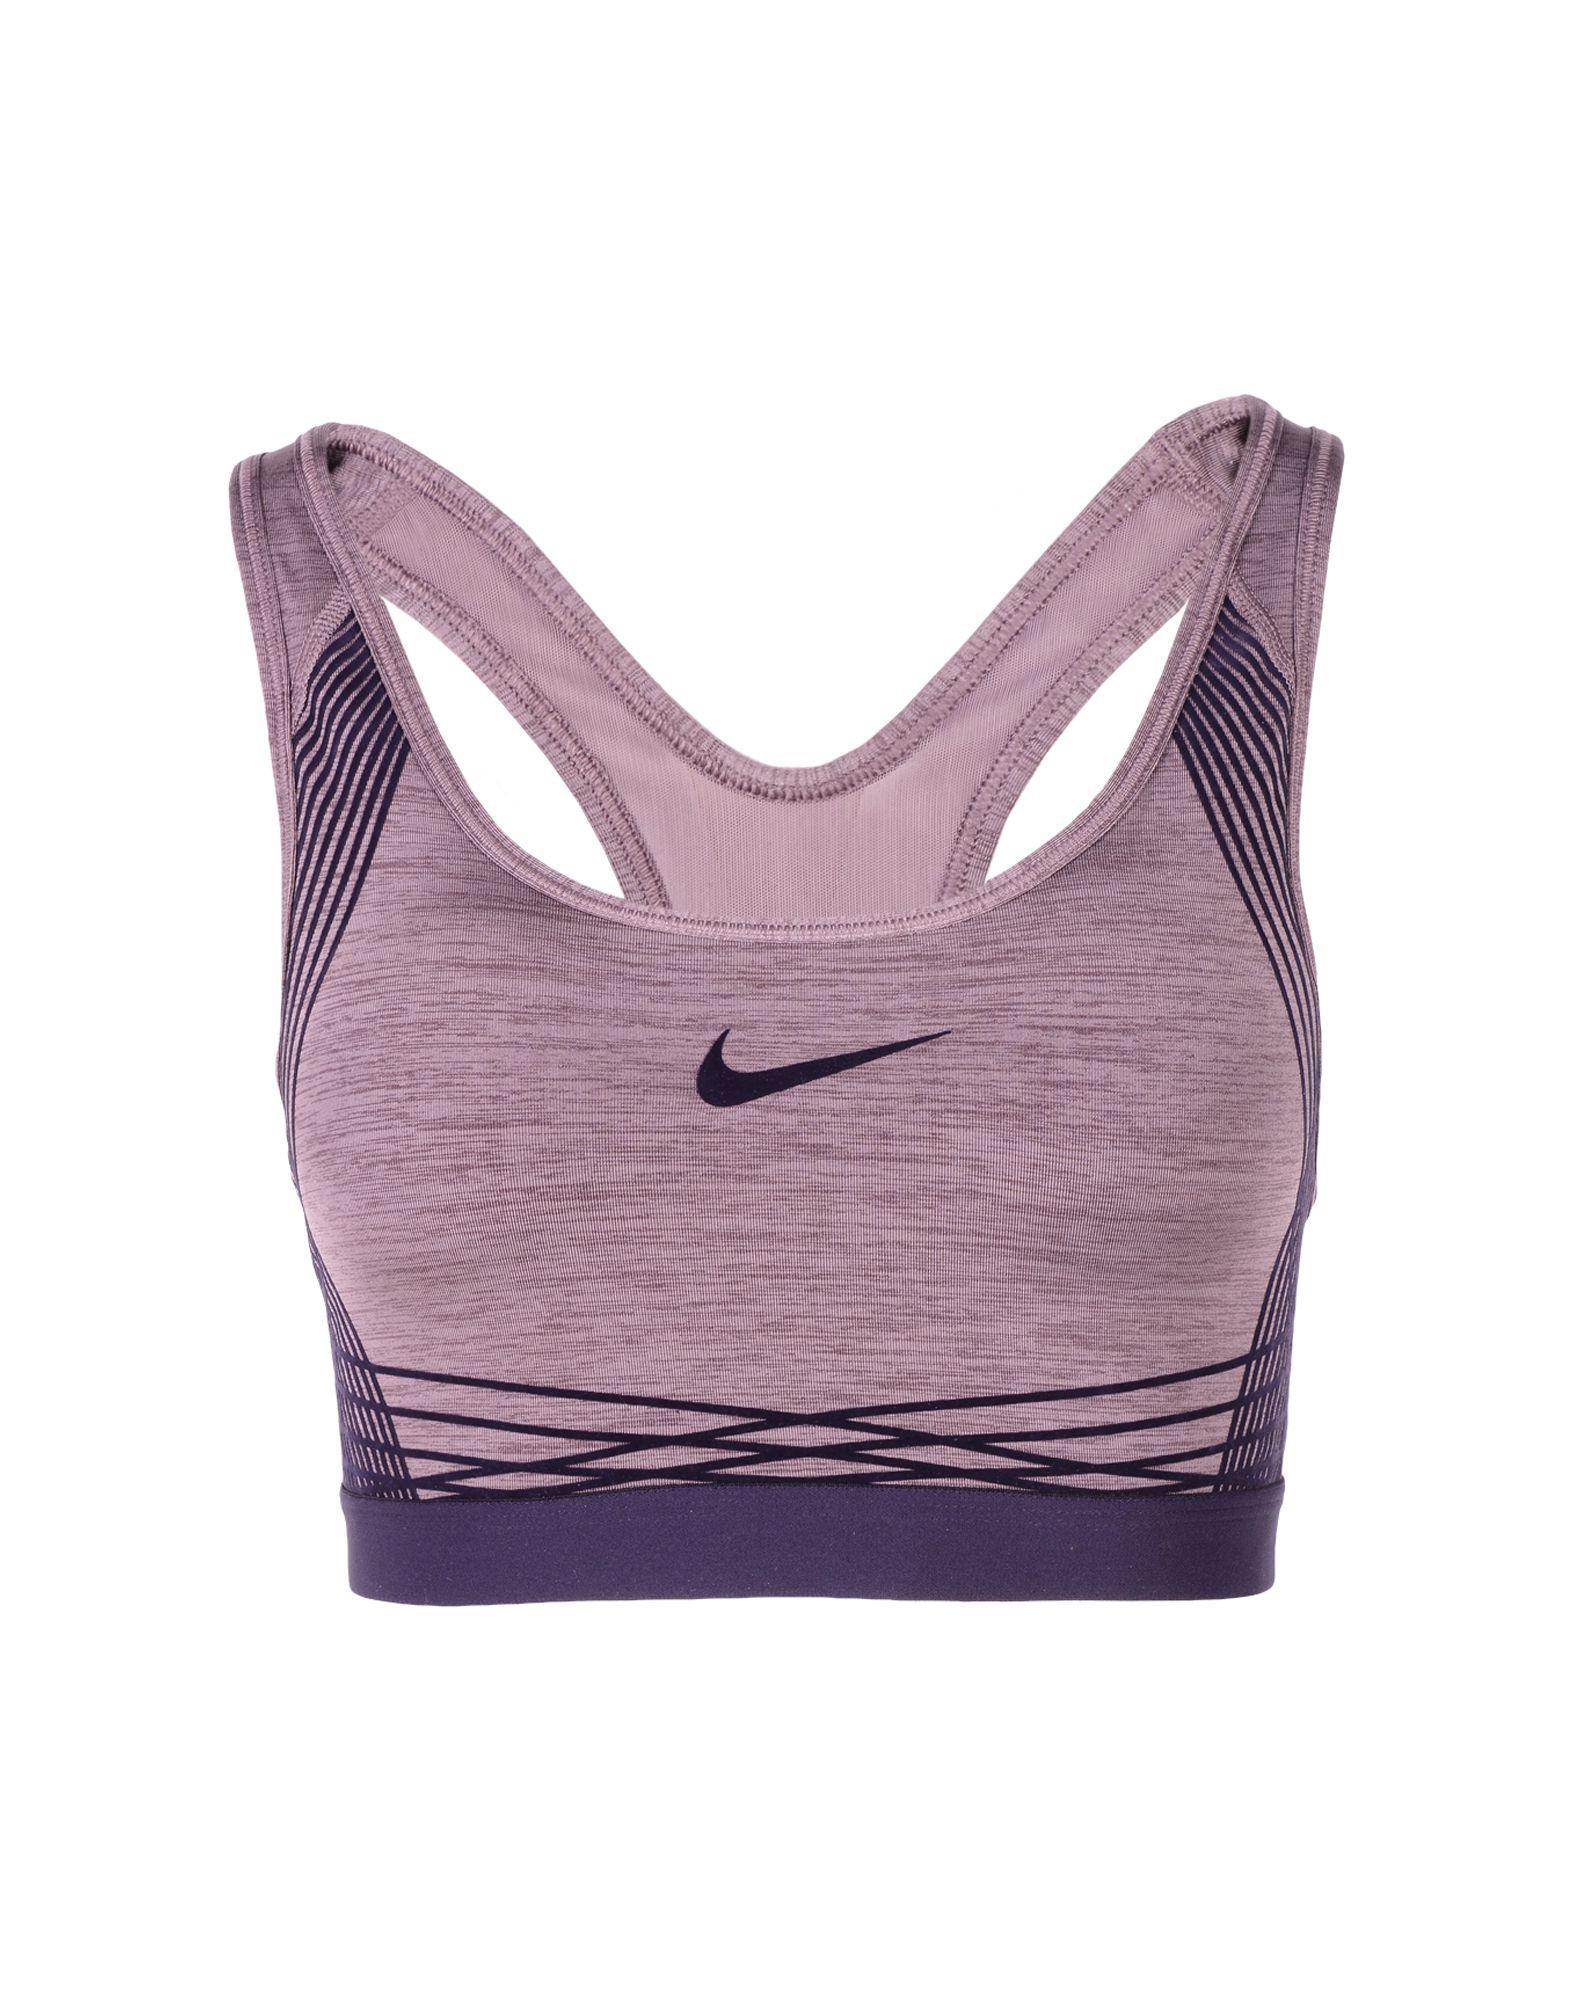 Nike Woman Tops